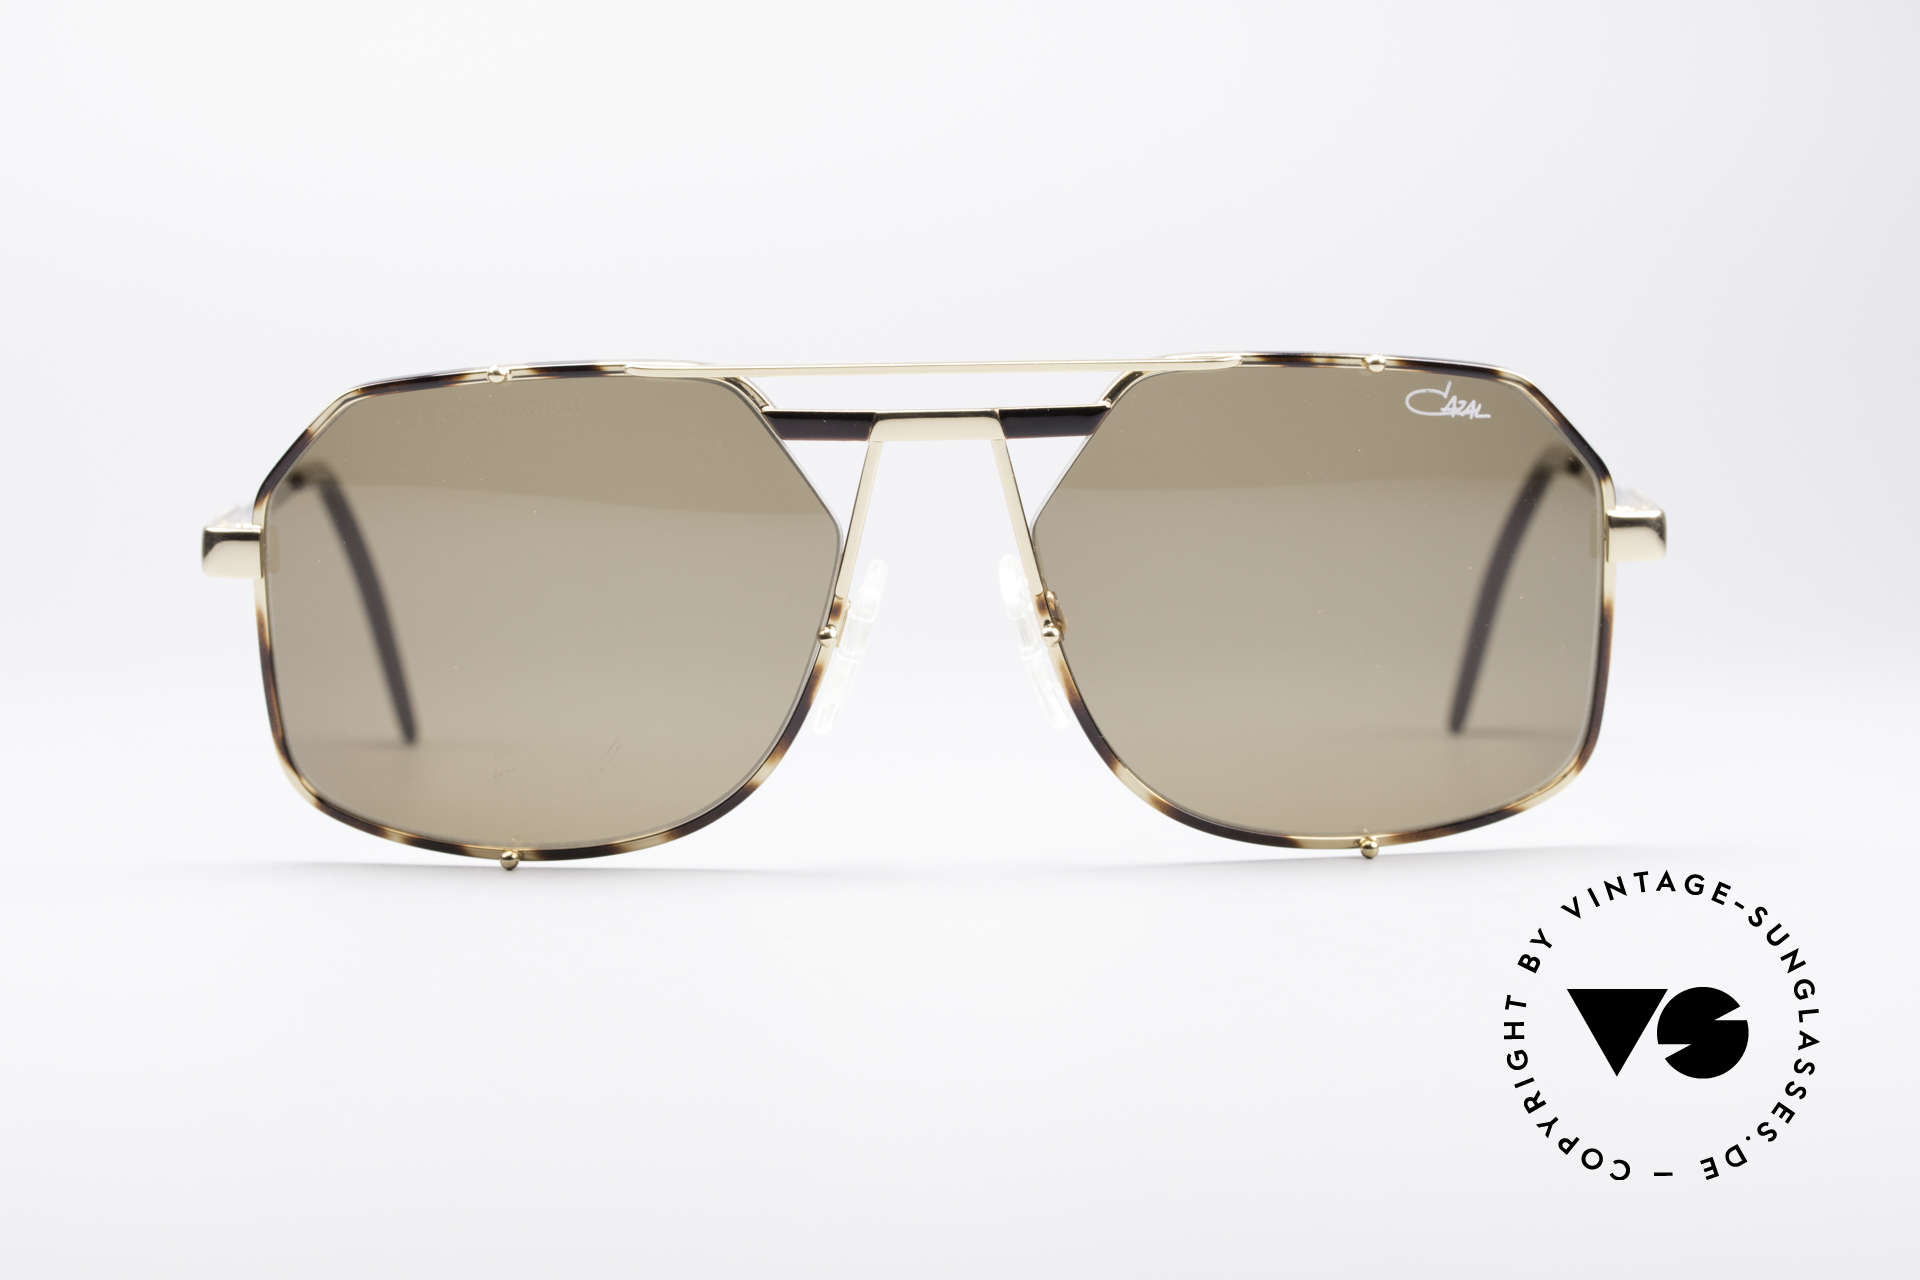 34736bc70d Sunglasses Cazal 959 90 s Gentlemen s Shades